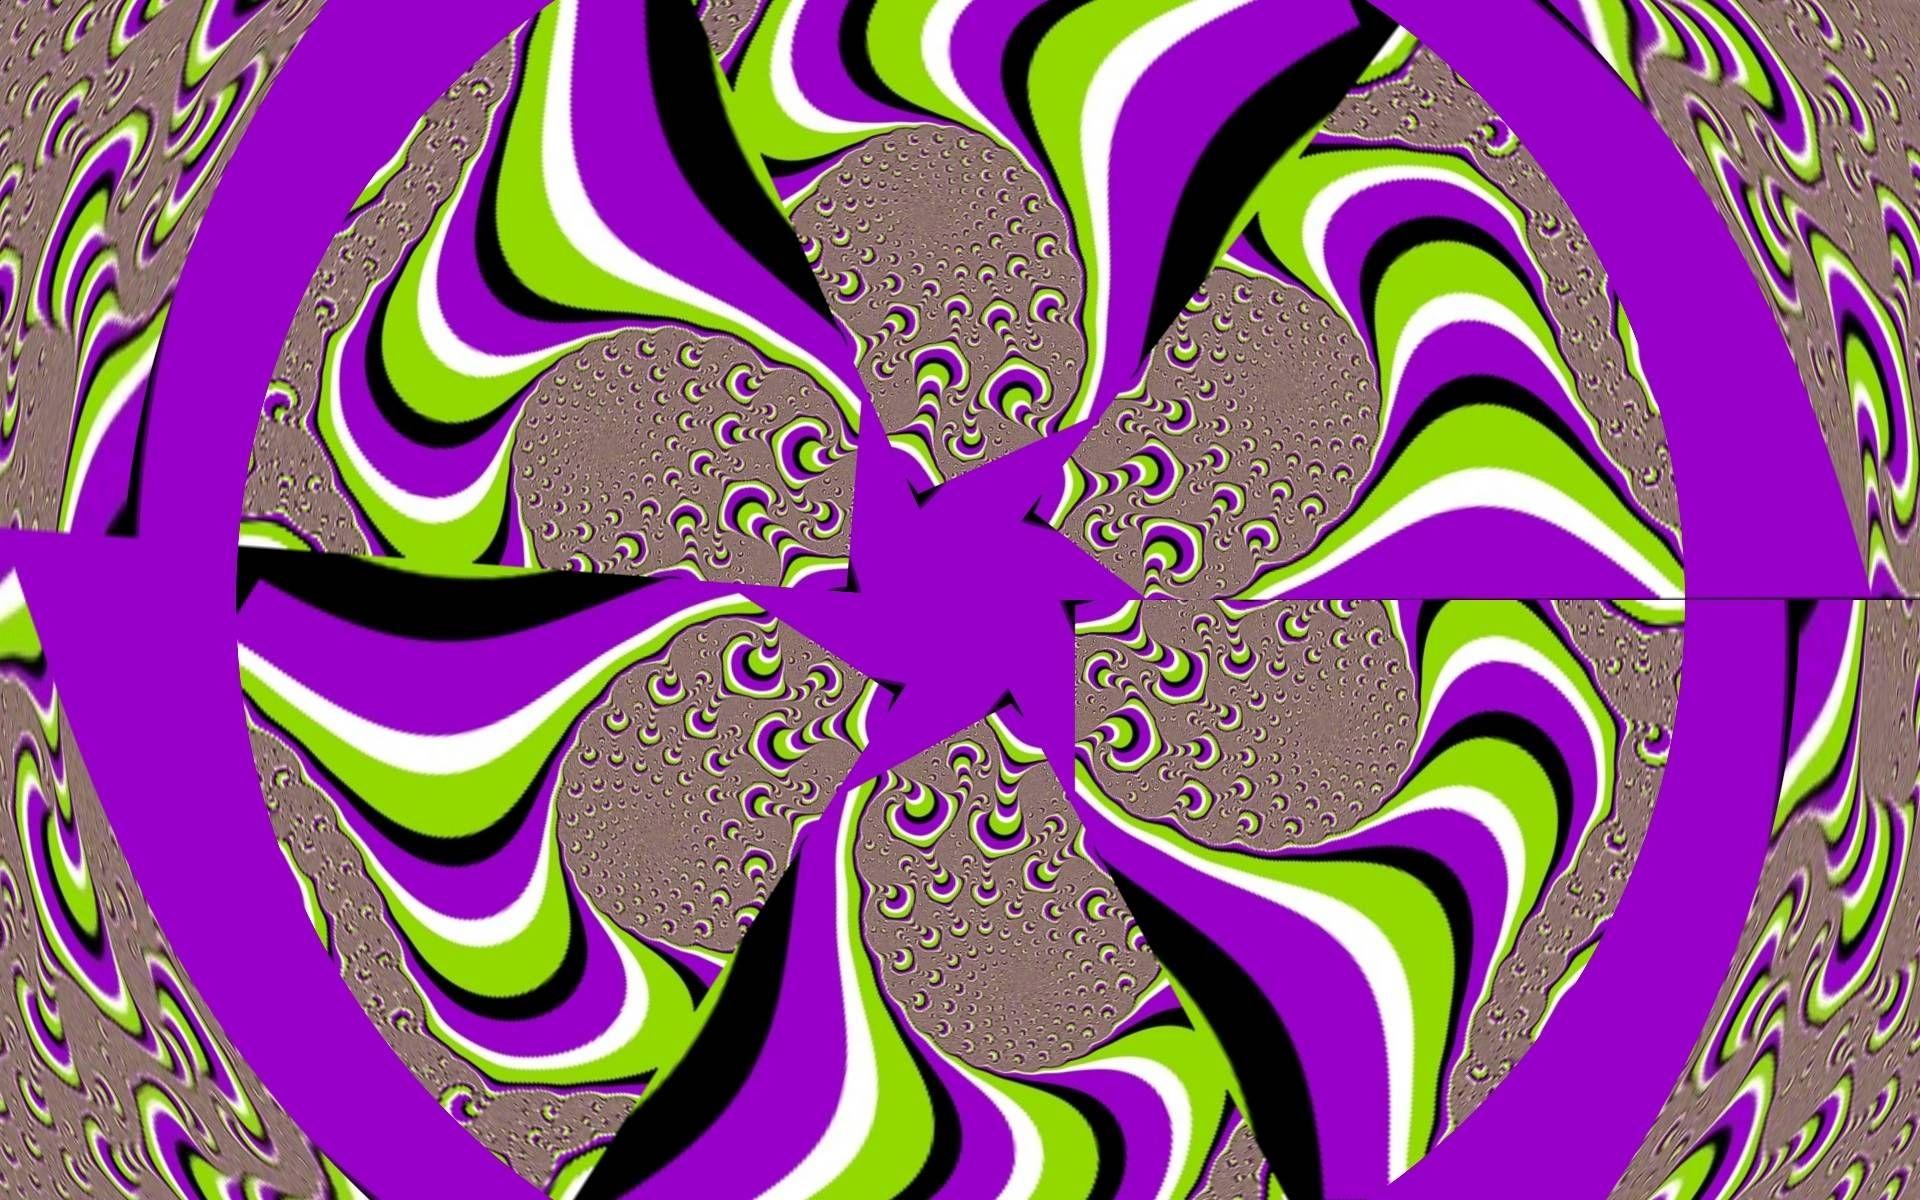 Moving optical illusions wallpaper hd free android application makes my eyes hurt - Optical illusion wallpaper hd ...